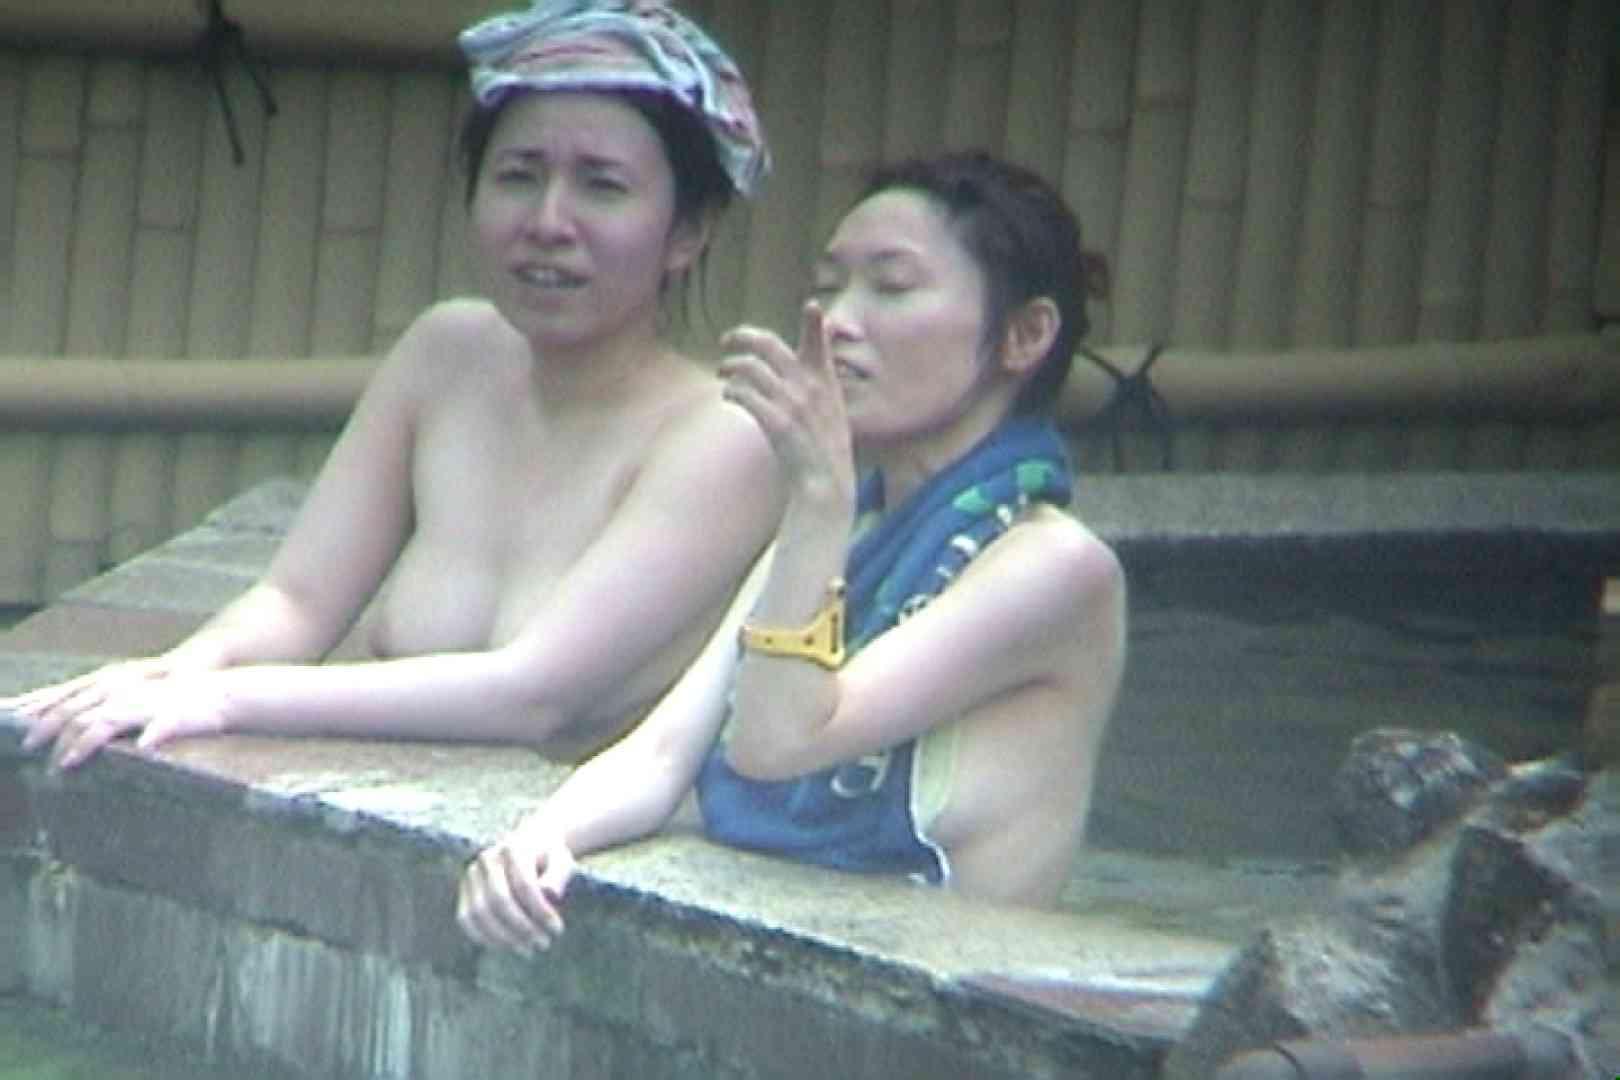 Aquaな露天風呂Vol.106 盗撮シリーズ | 露天風呂編  86PIX 1